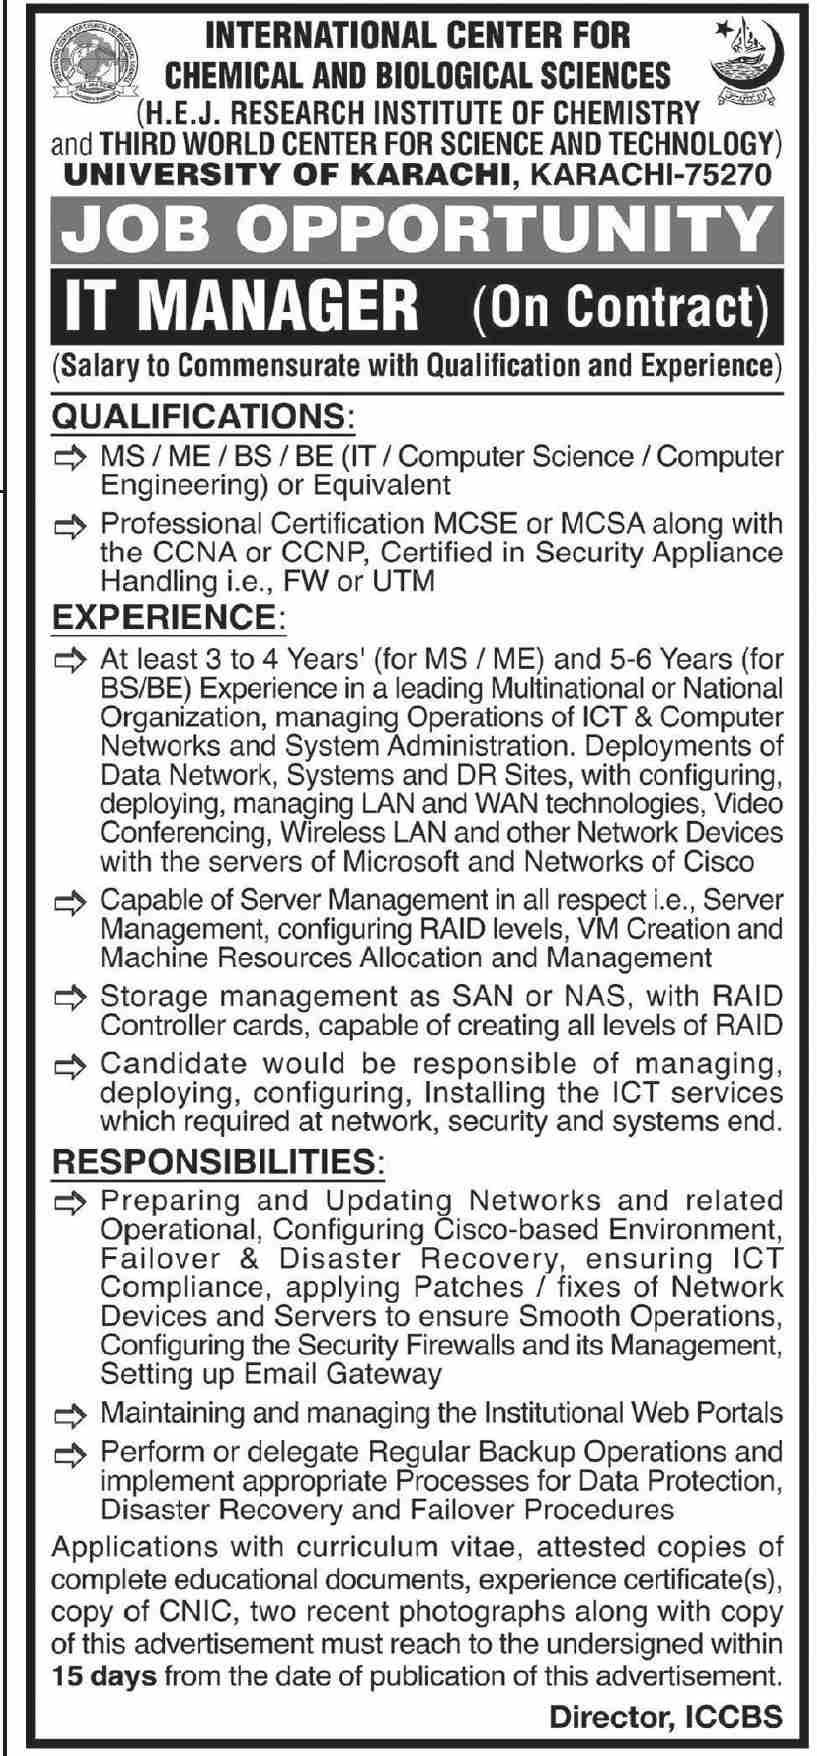 University of Karachi Job 2021 For IT Manager